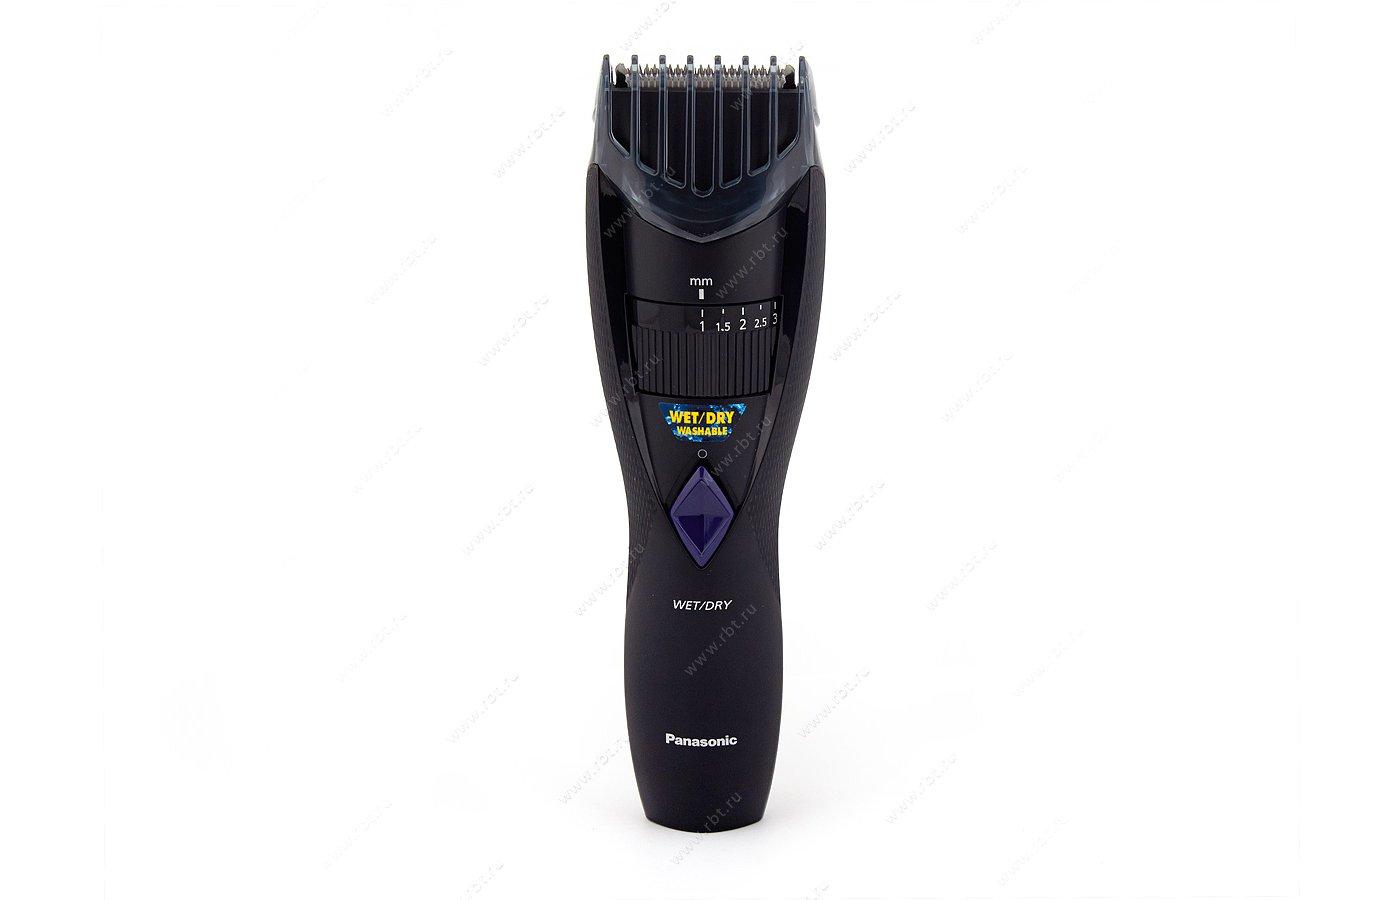 Машинка для стрижки волос PANASONIC ER-GB37-K520